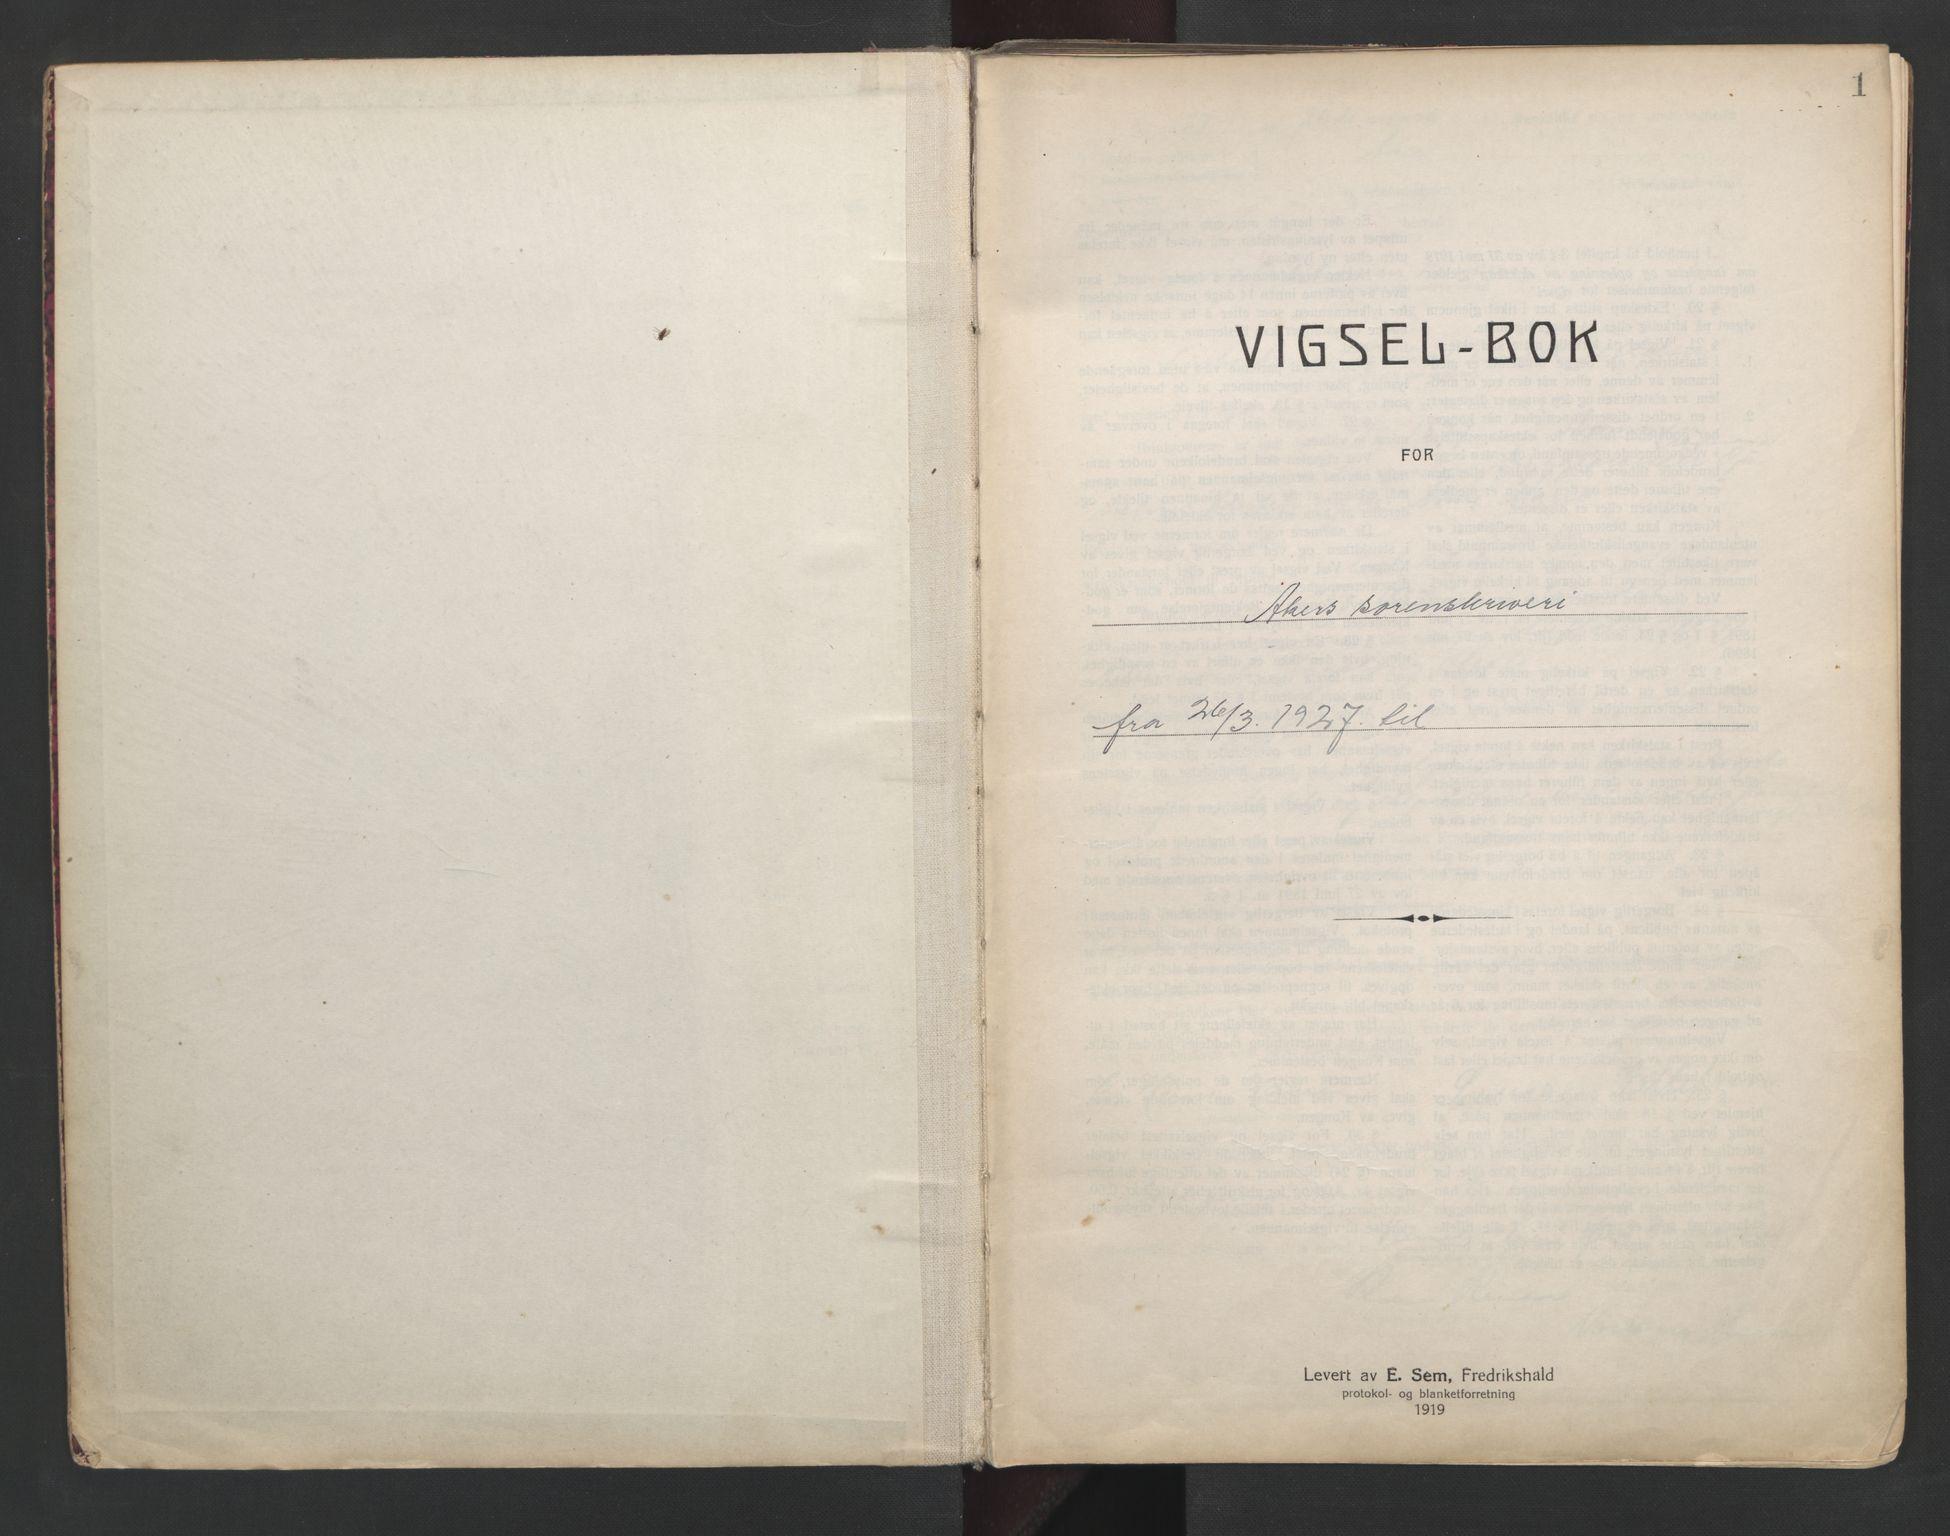 SAO, Aker sorenskriveri, L/Lc/Lcb/L0004: Vigselprotokoll, 1927-1929, s. 1